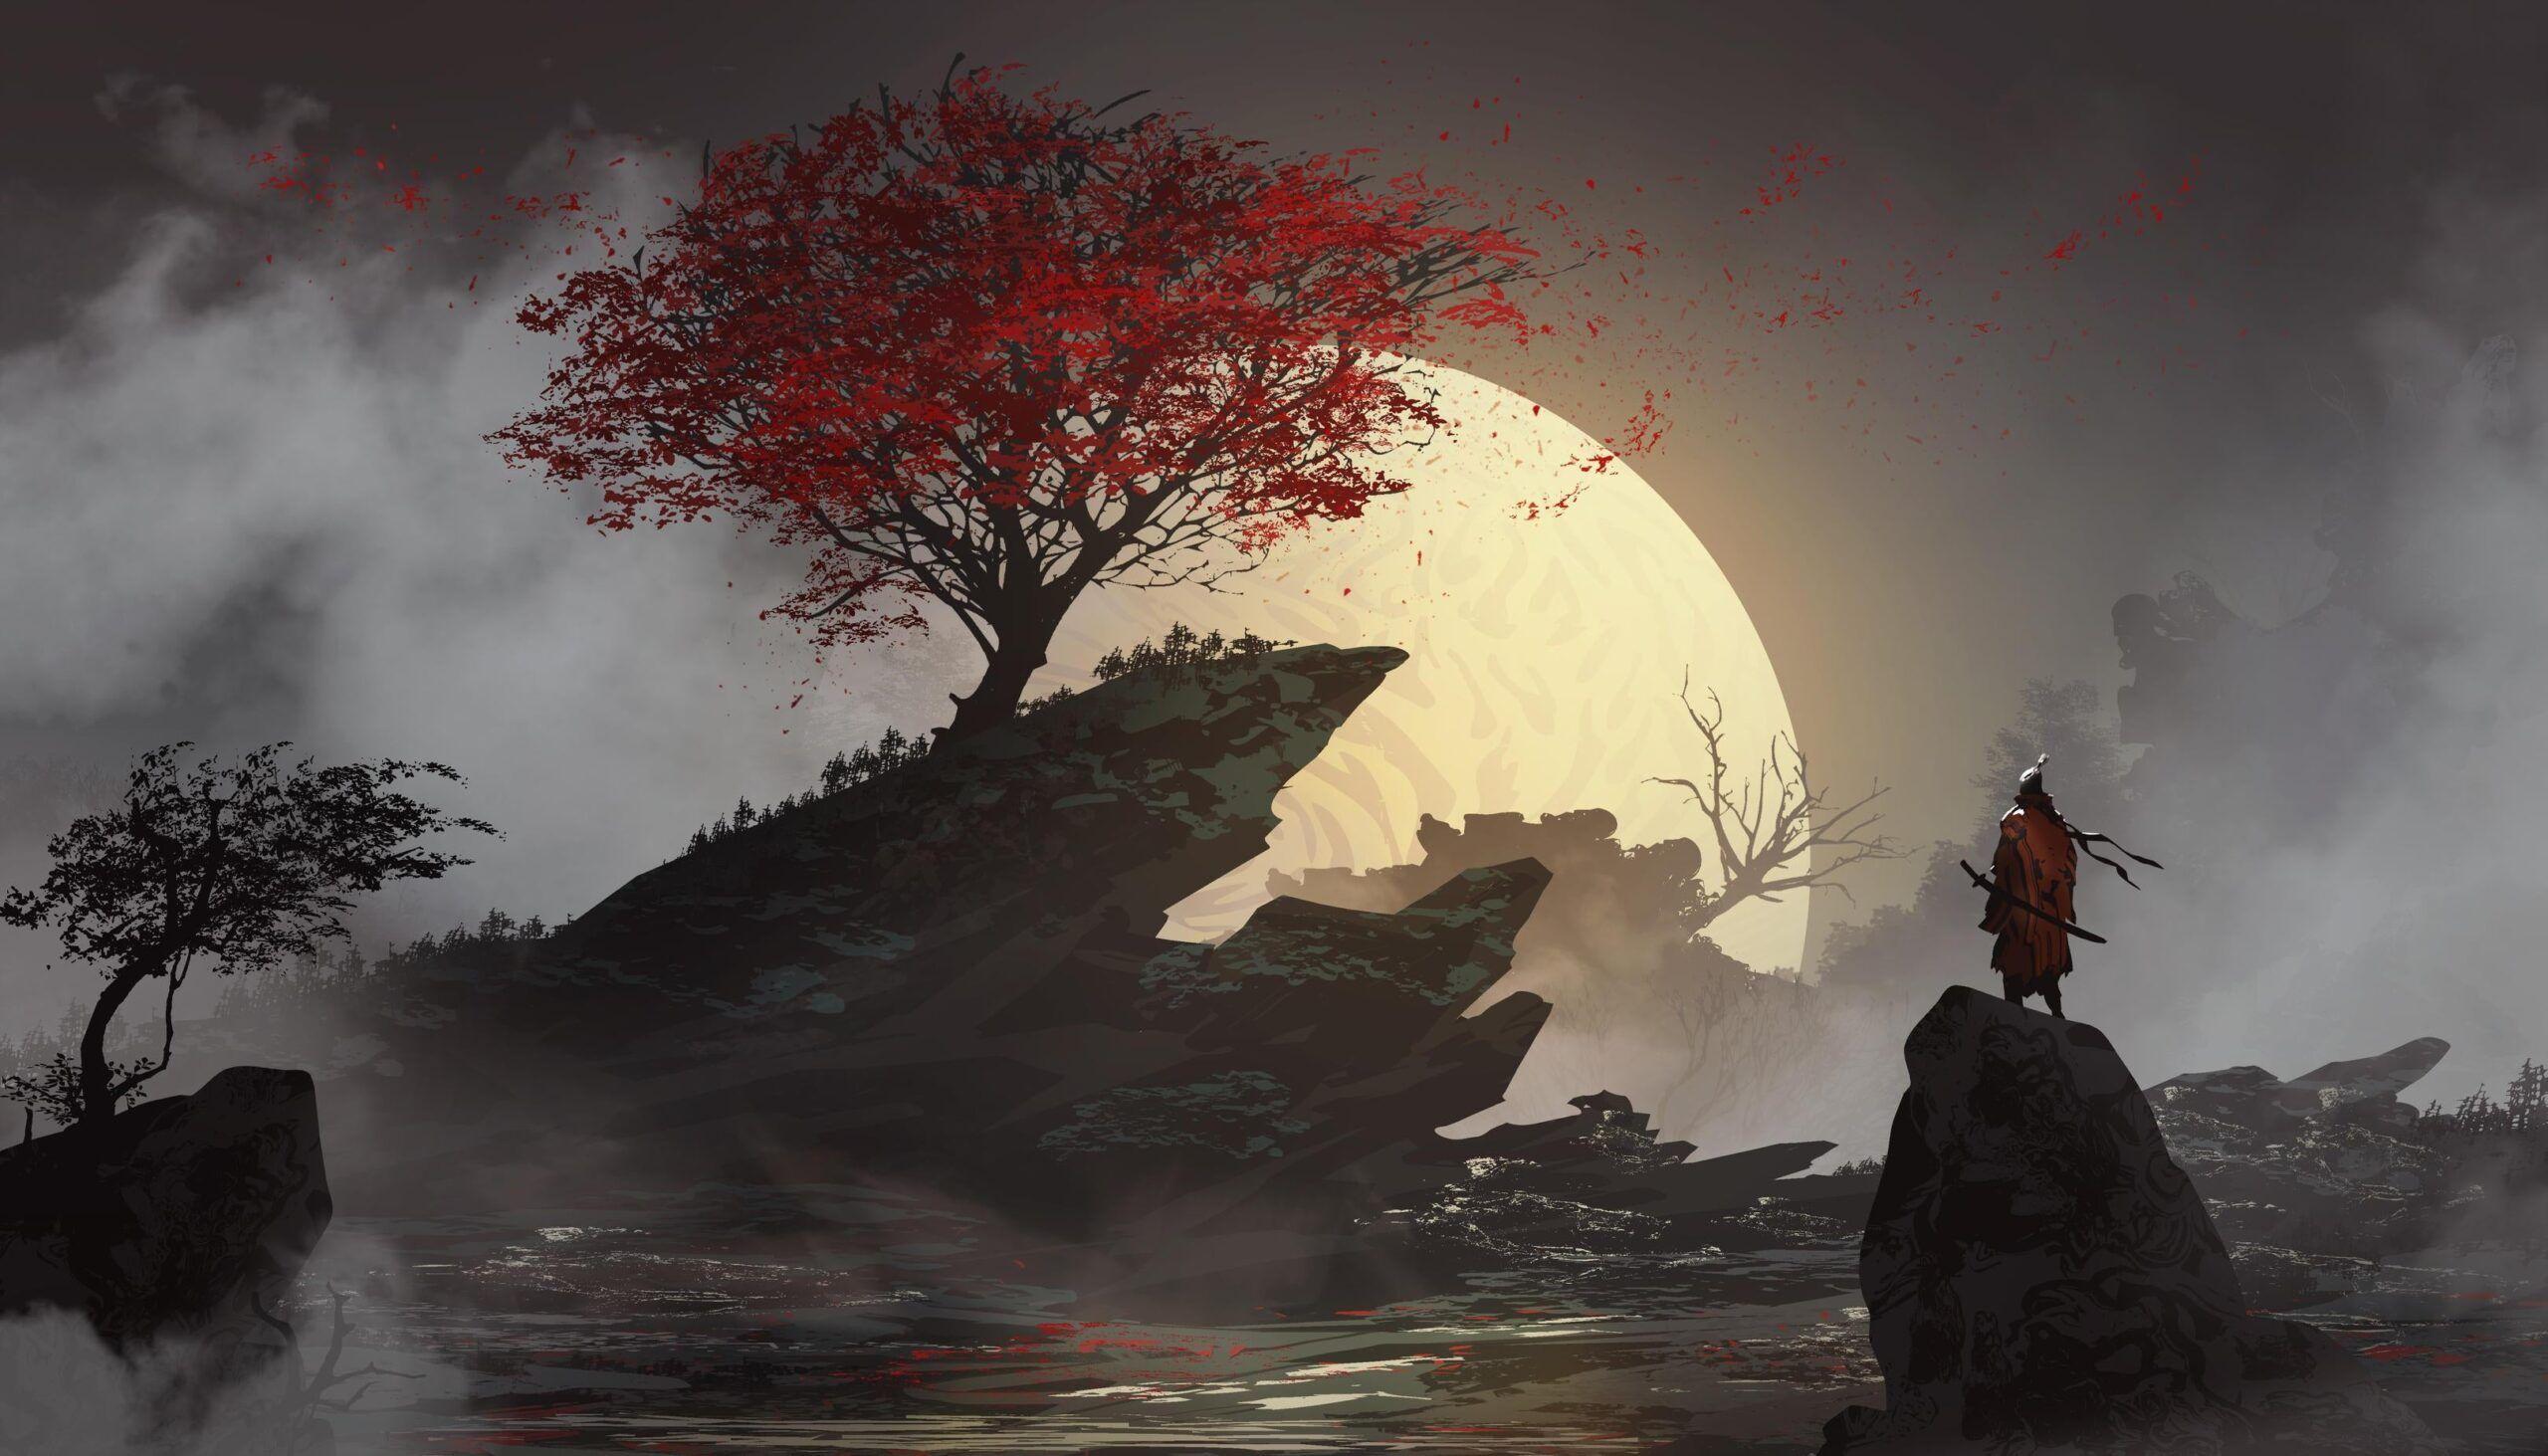 Lone Samurai In 2020 Desktop Wallpaper Art Samurai Wallpaper Anime Wallpaper 1920x1080